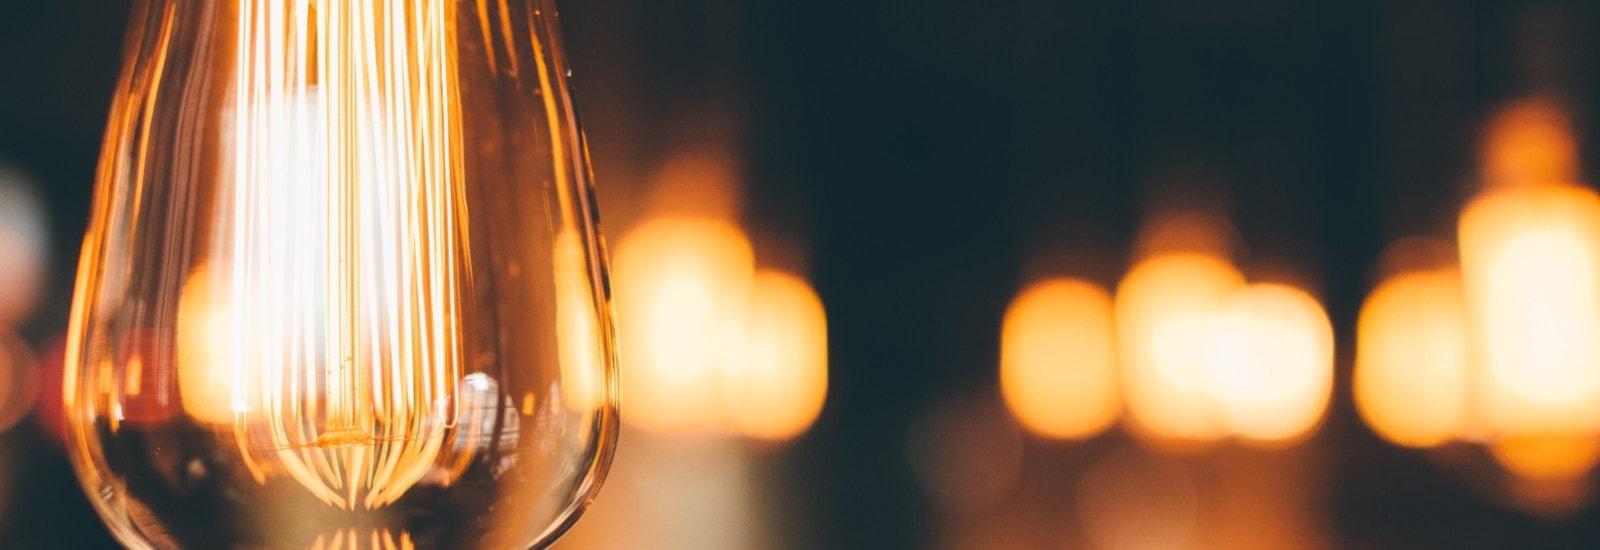 lamp-licht-random